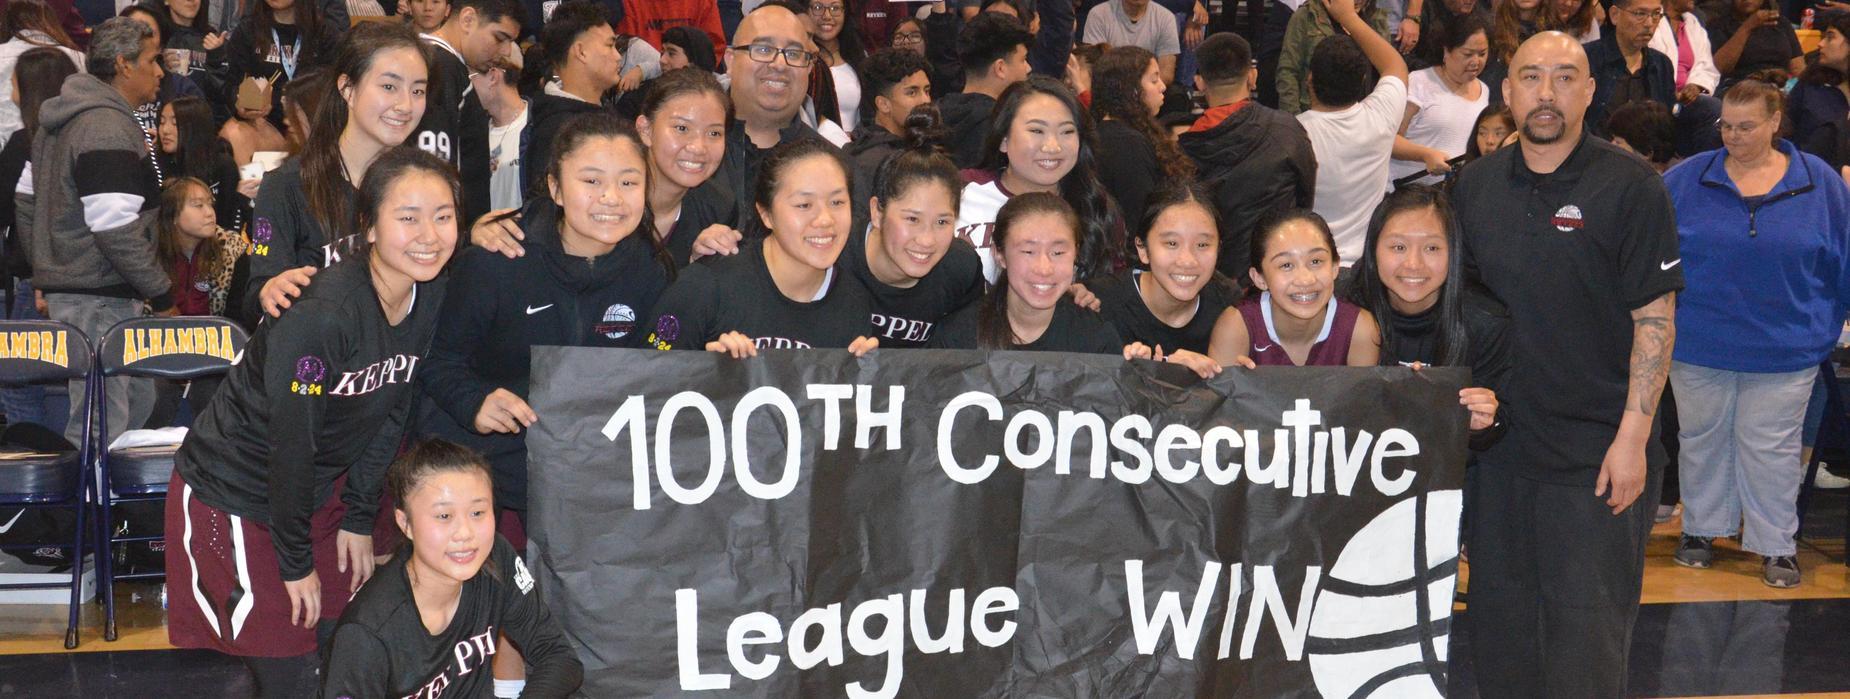 MKHS Girls Basketball 100th consecutive league win